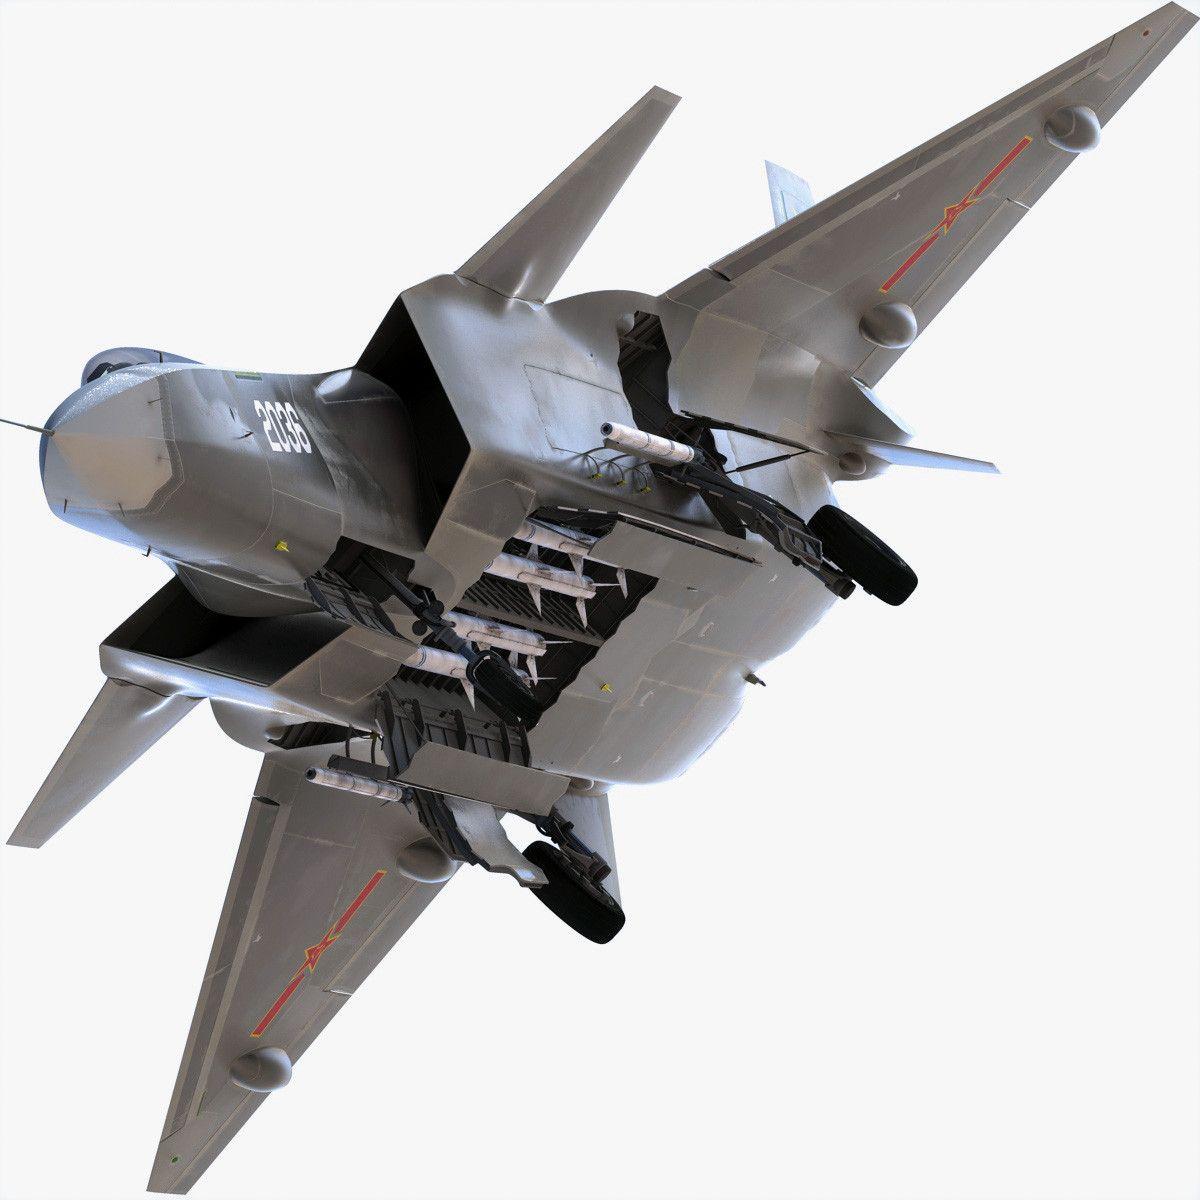 http://www.turbosquid.com/3d-models/3ds-max-chengdu-j-20/744687